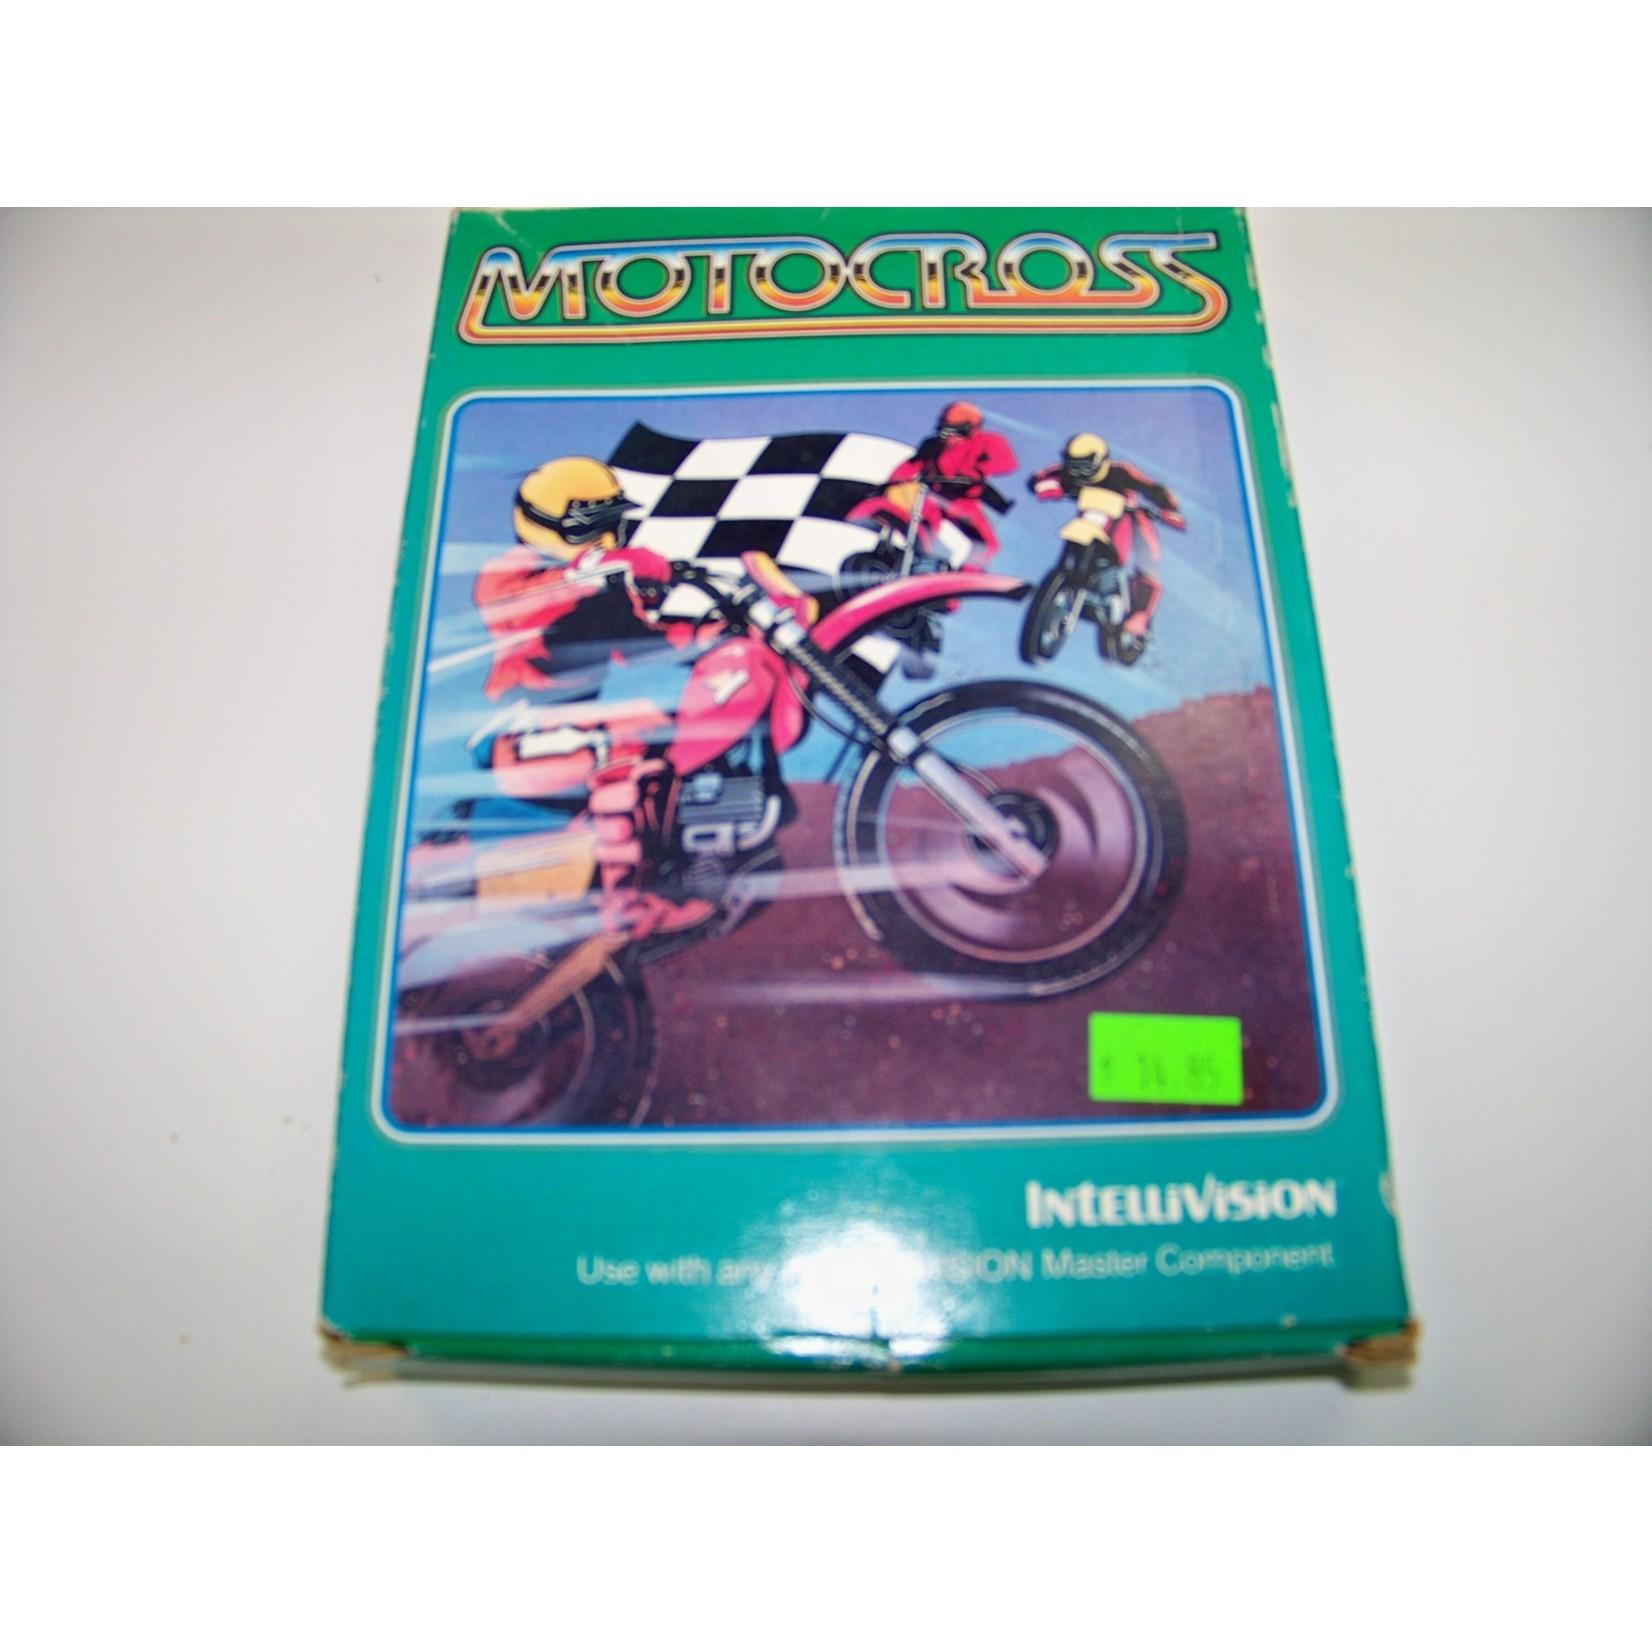 intvu-Motocross (complete)